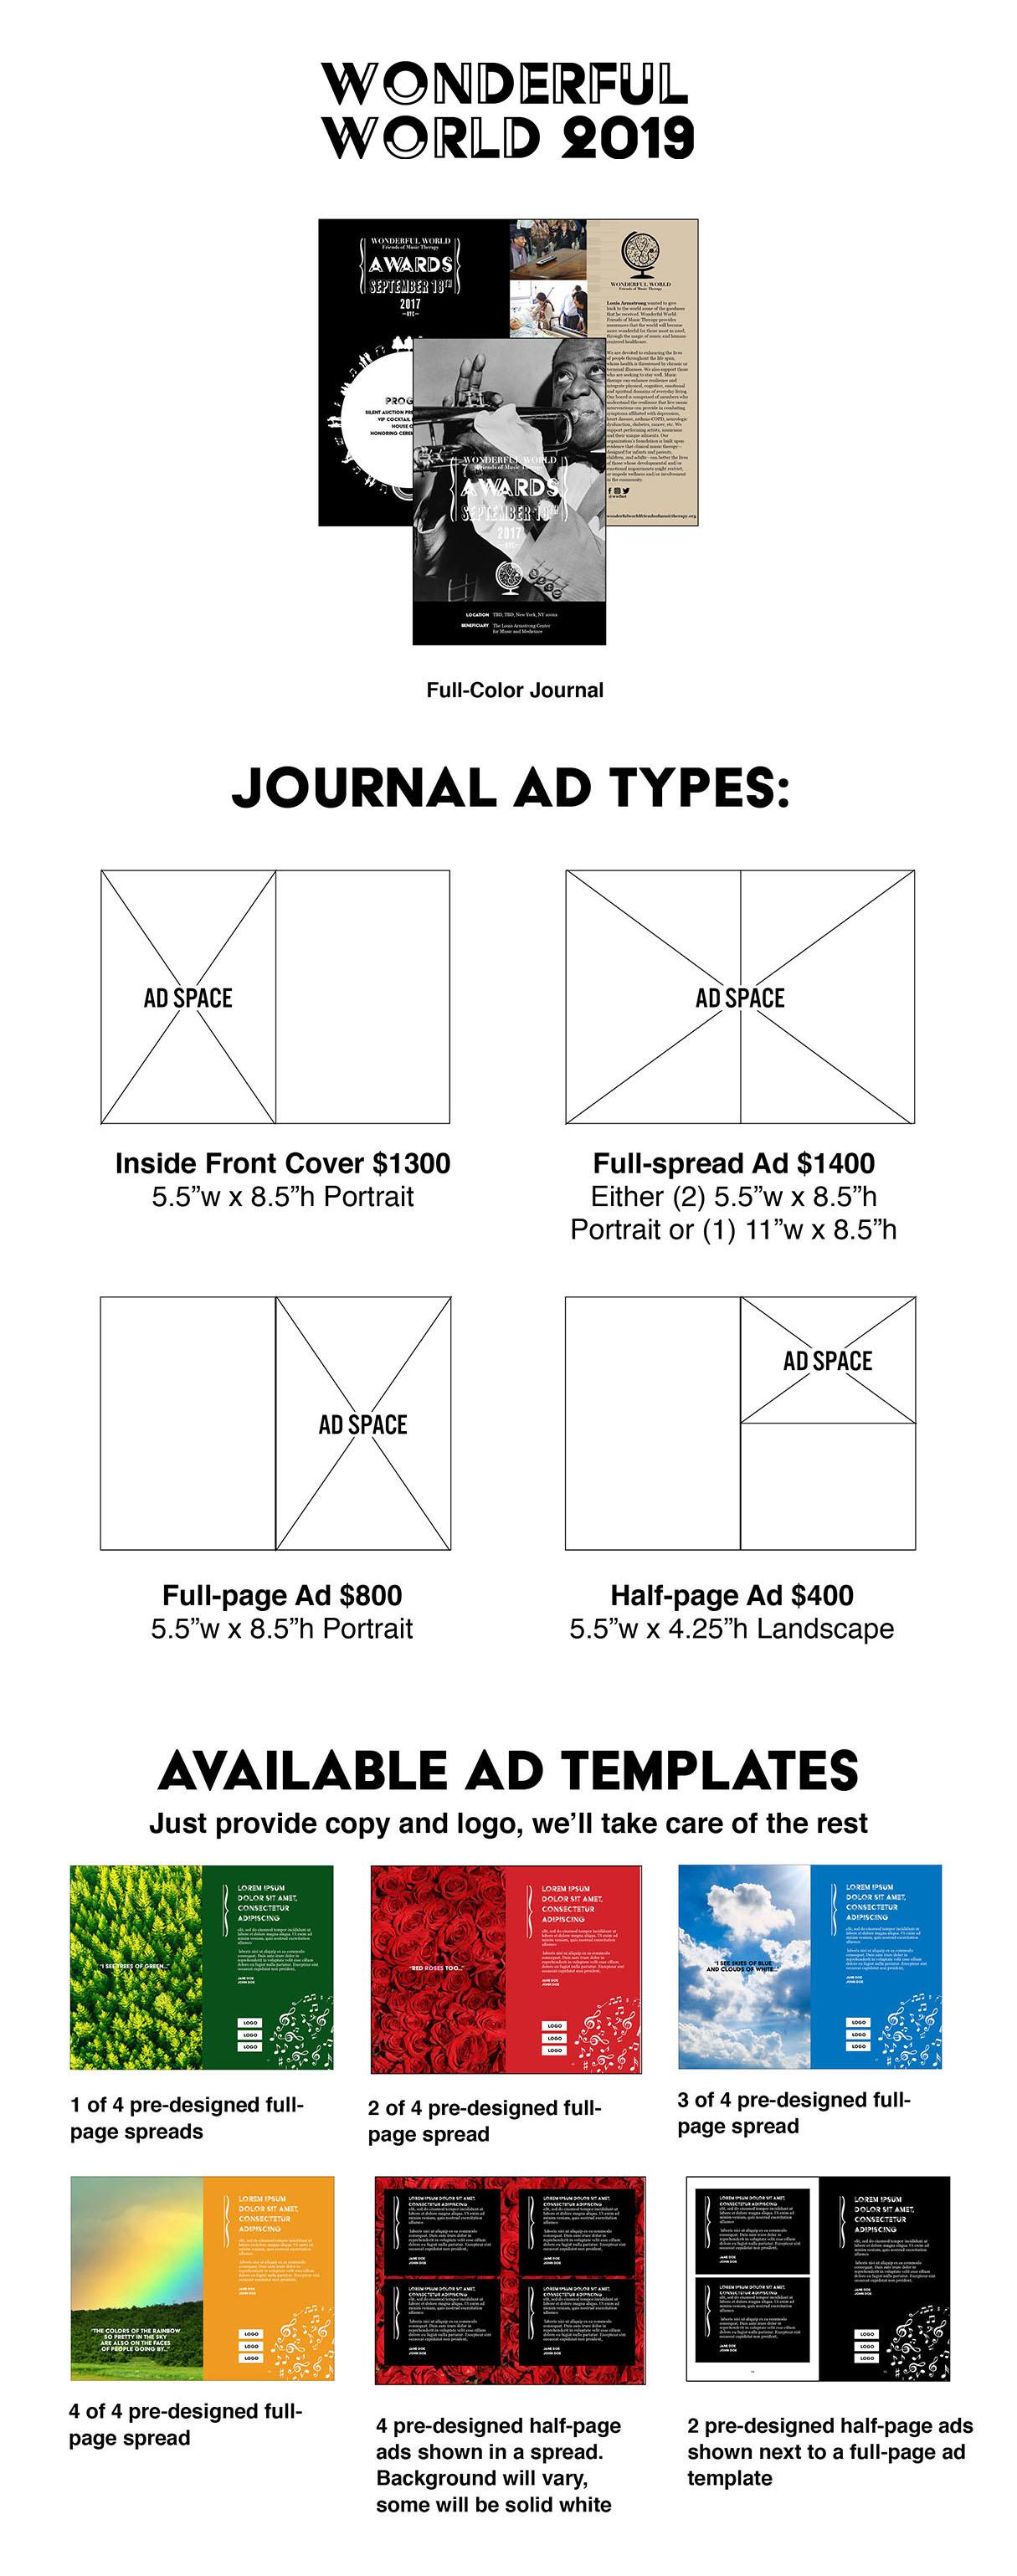 Wonderful World 2019 Journal Ads Overview